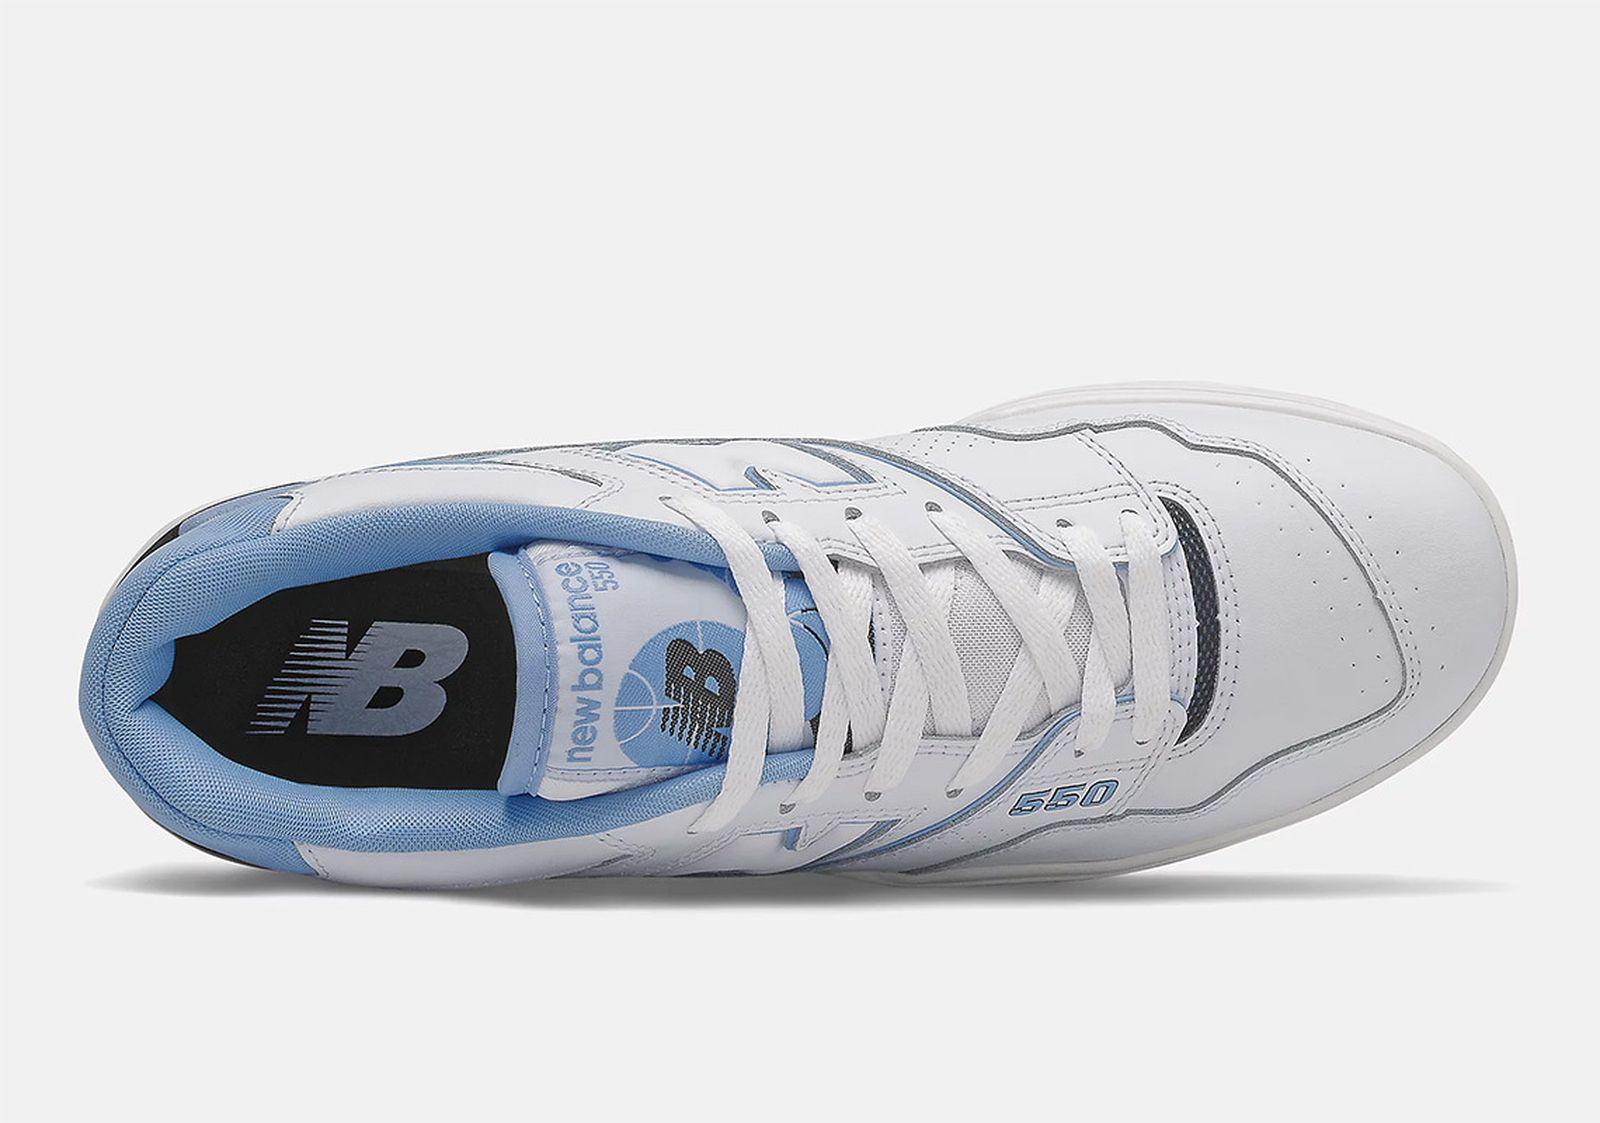 new-balance-550-light-blue-release-date-price-02